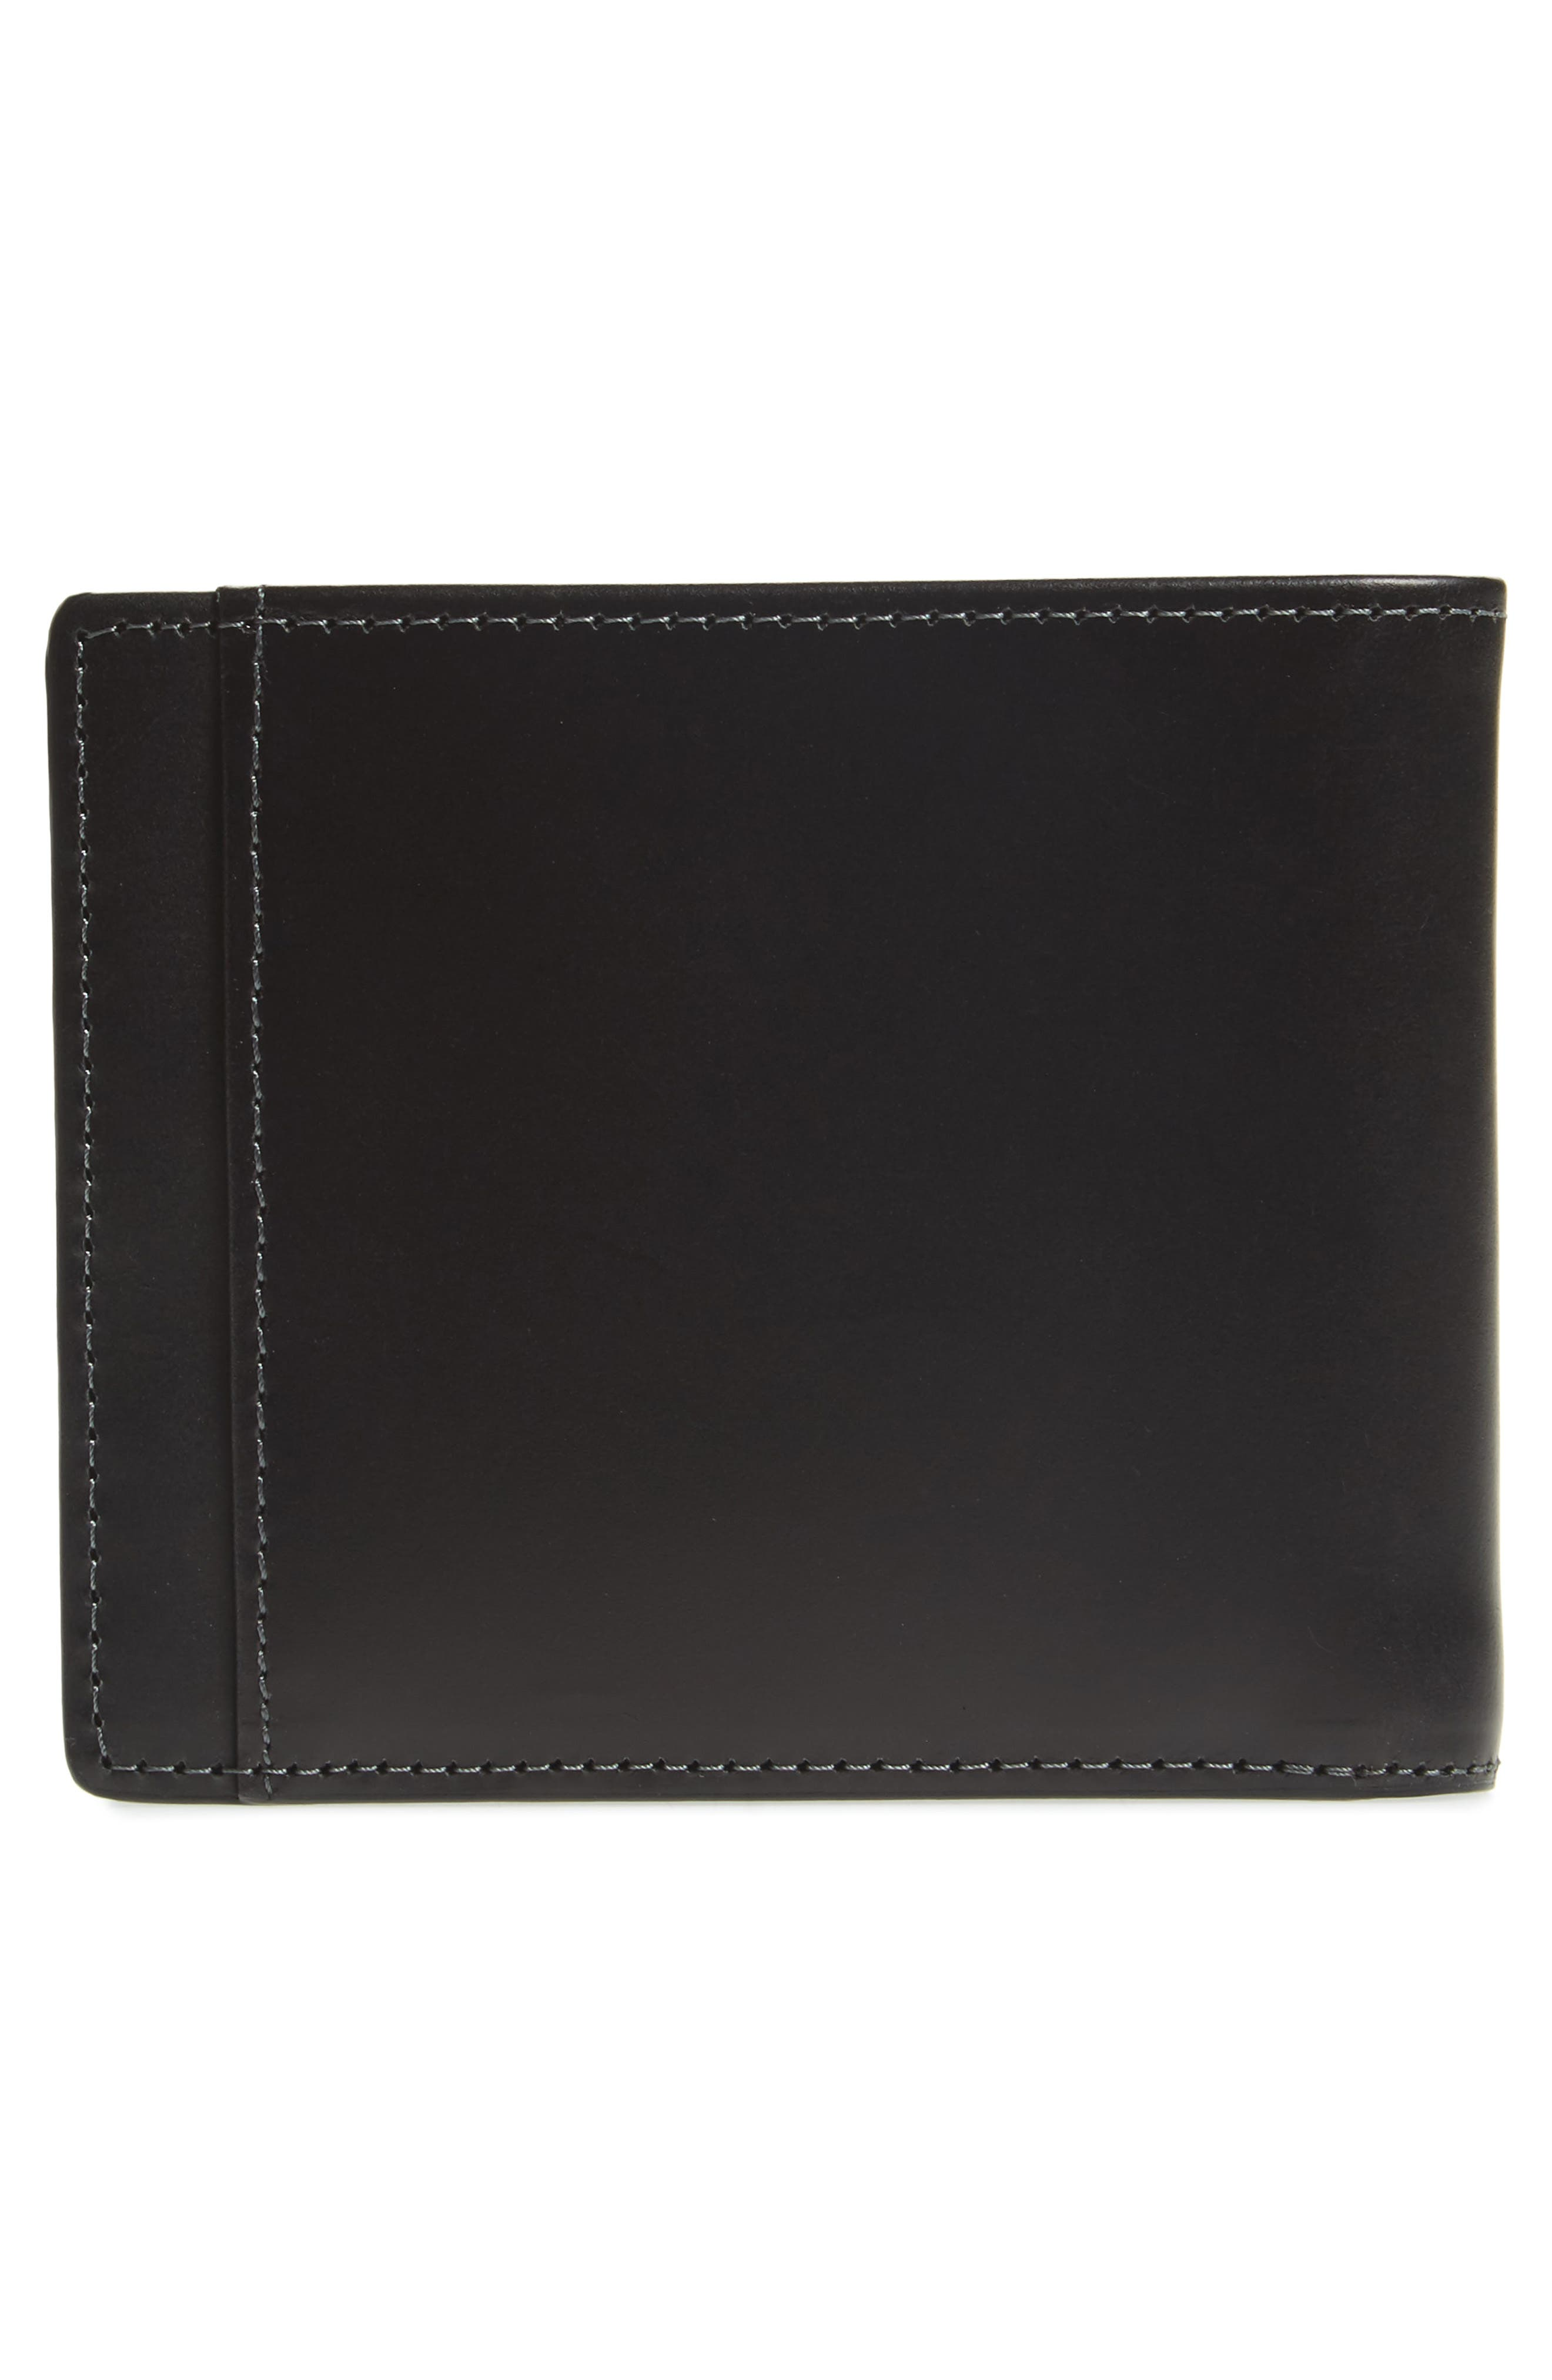 NORDSTROM MEN'S SHOP, Wyatt RFID Leather Wallet, Alternate thumbnail 3, color, BLACK